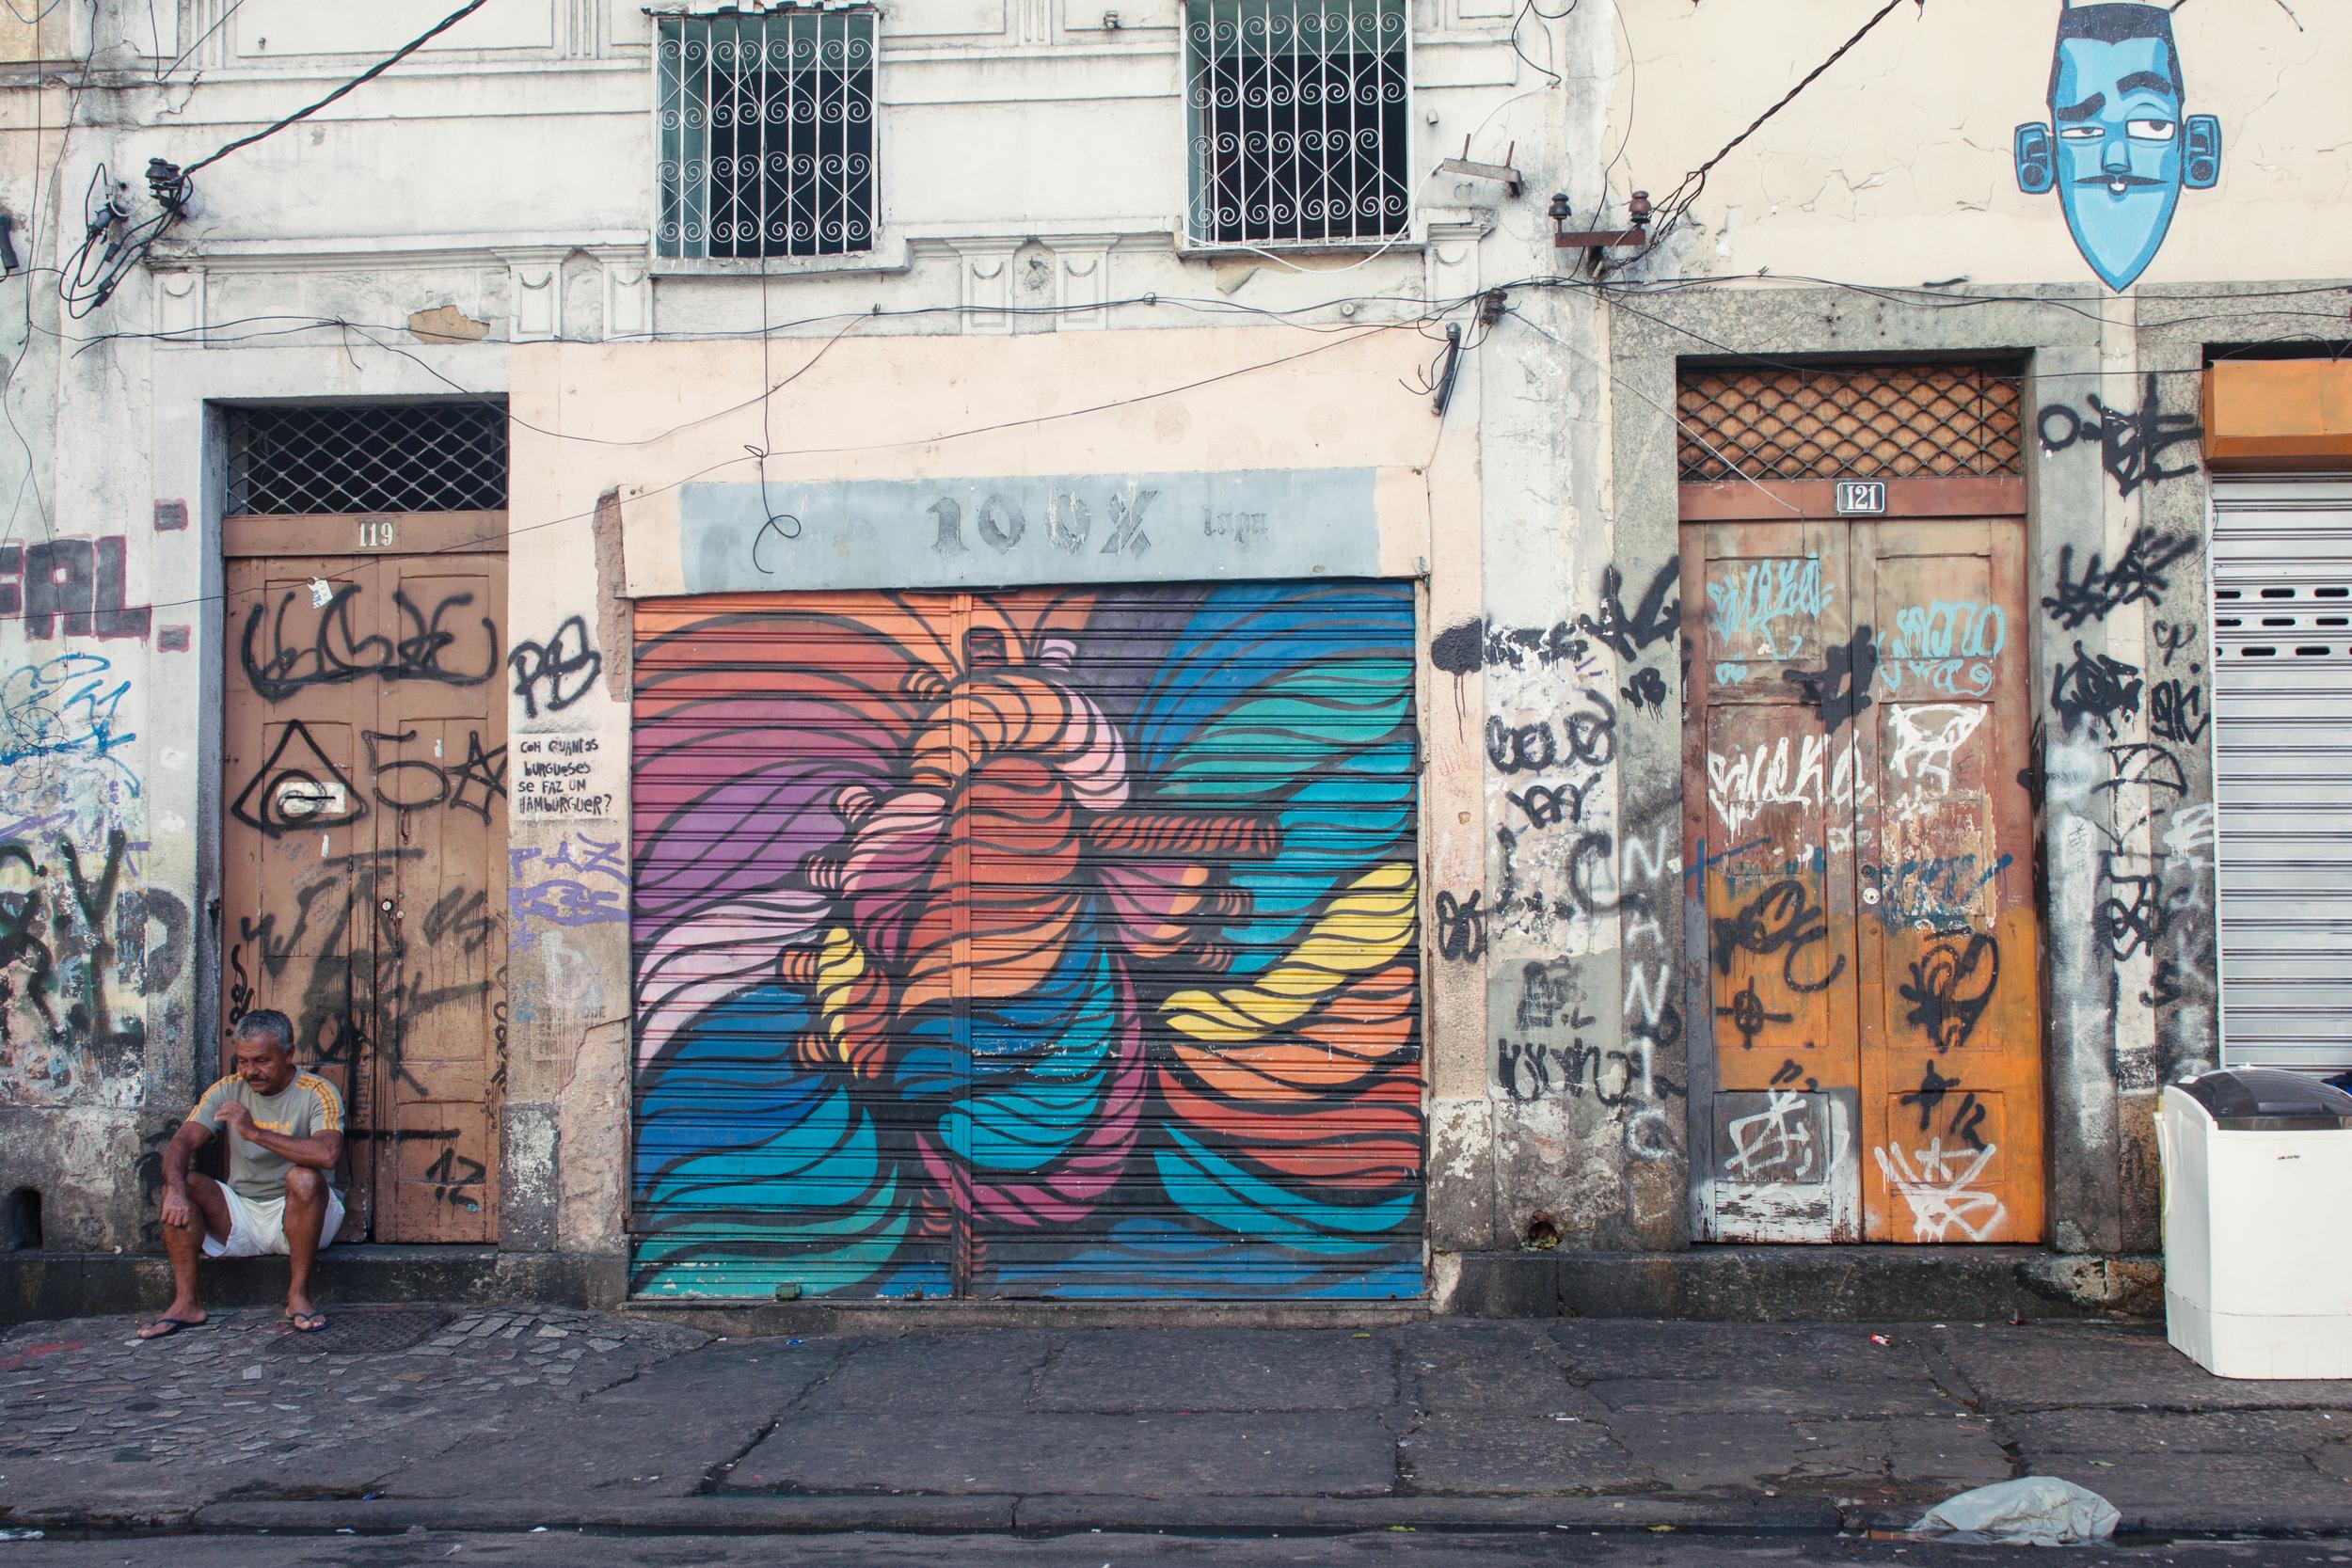 Brazil, Rio de Janeiro, Landscape, Travel photography, architecture, Lapa, arched bridge, street photography, graffiti